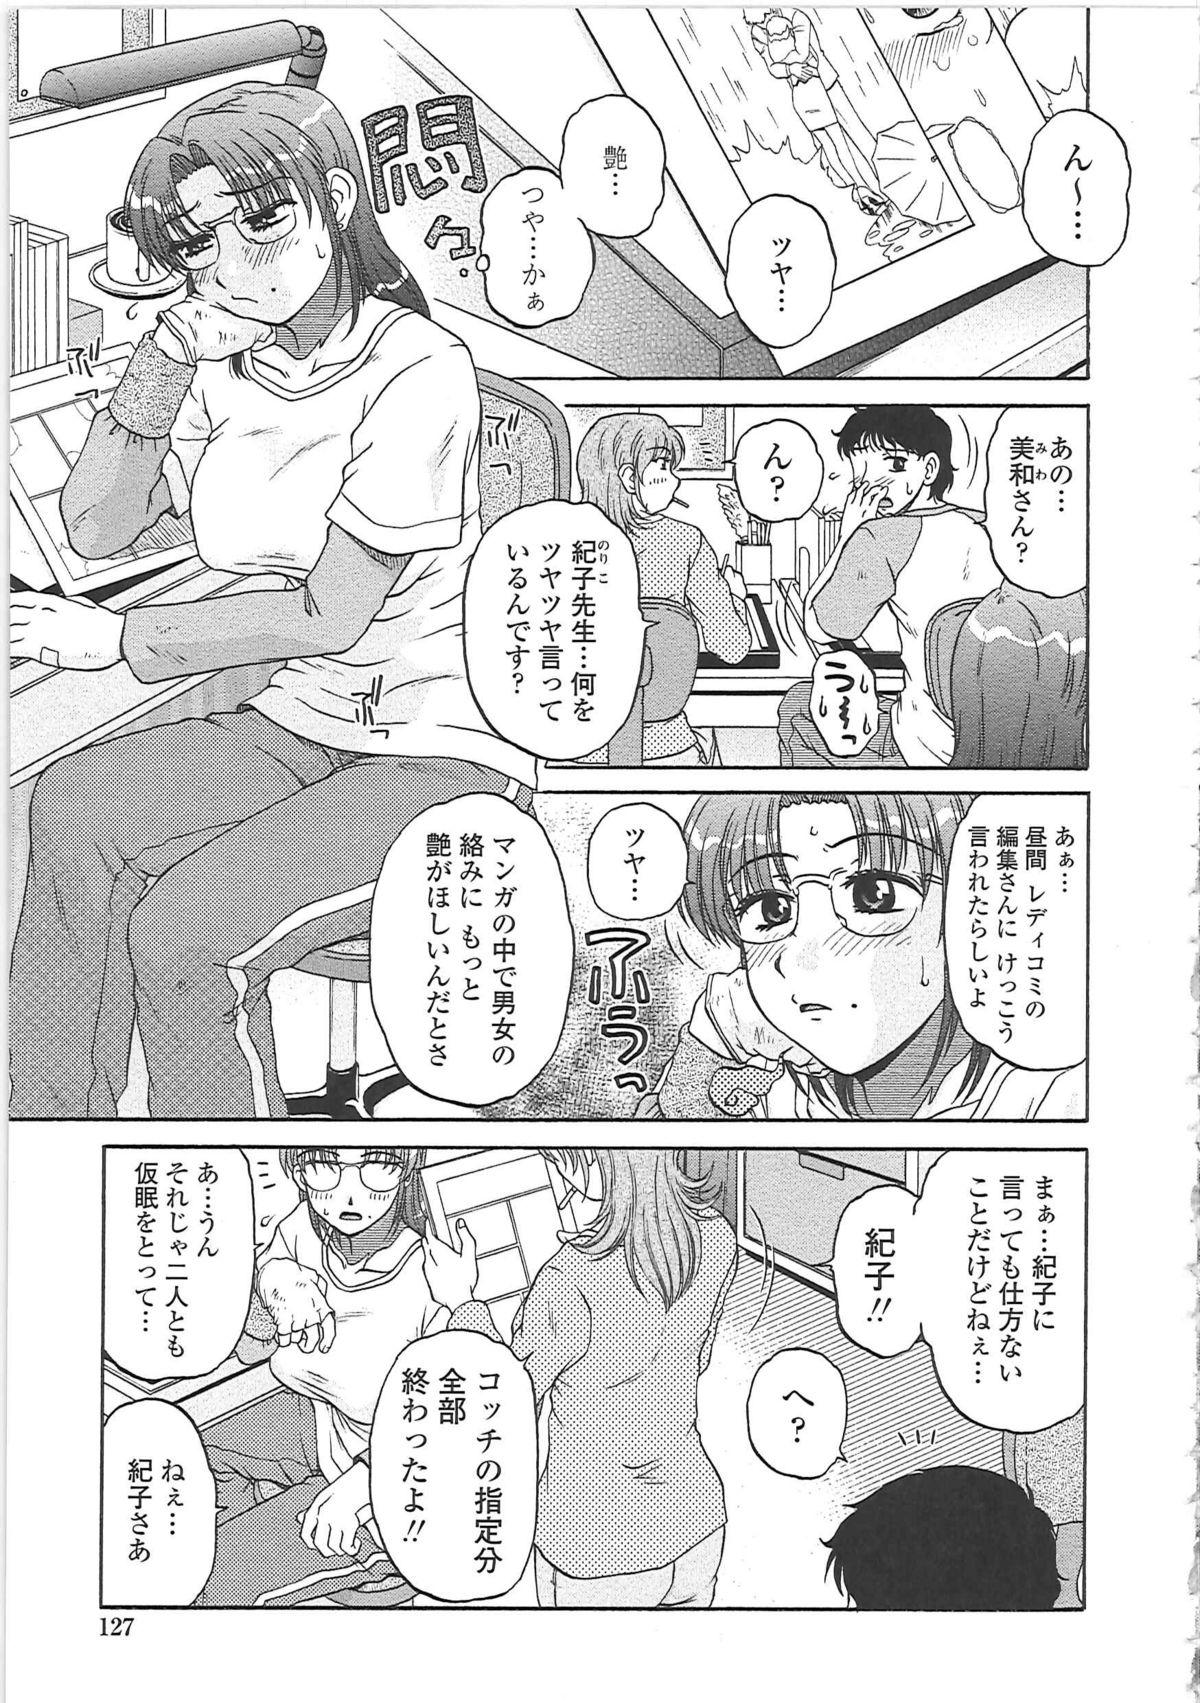 Nikuzuma Tsuushin - Erotic Wife Communication 131